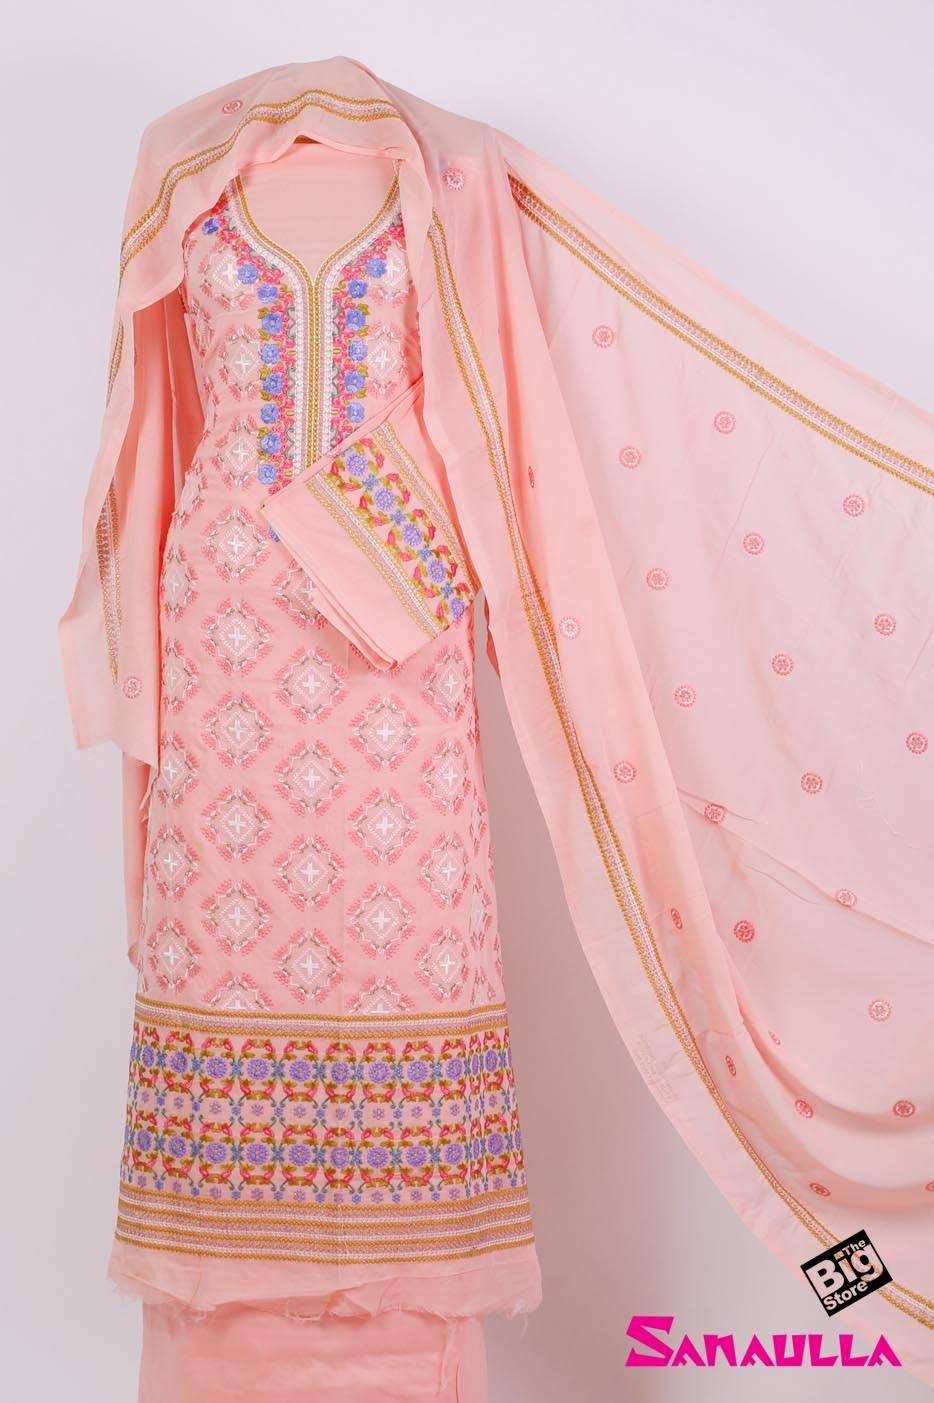 Sanaulla Exclusive Range Embroidered Swiss Voile Unstitched 3 Piece Suit SAZZ 706 Pink